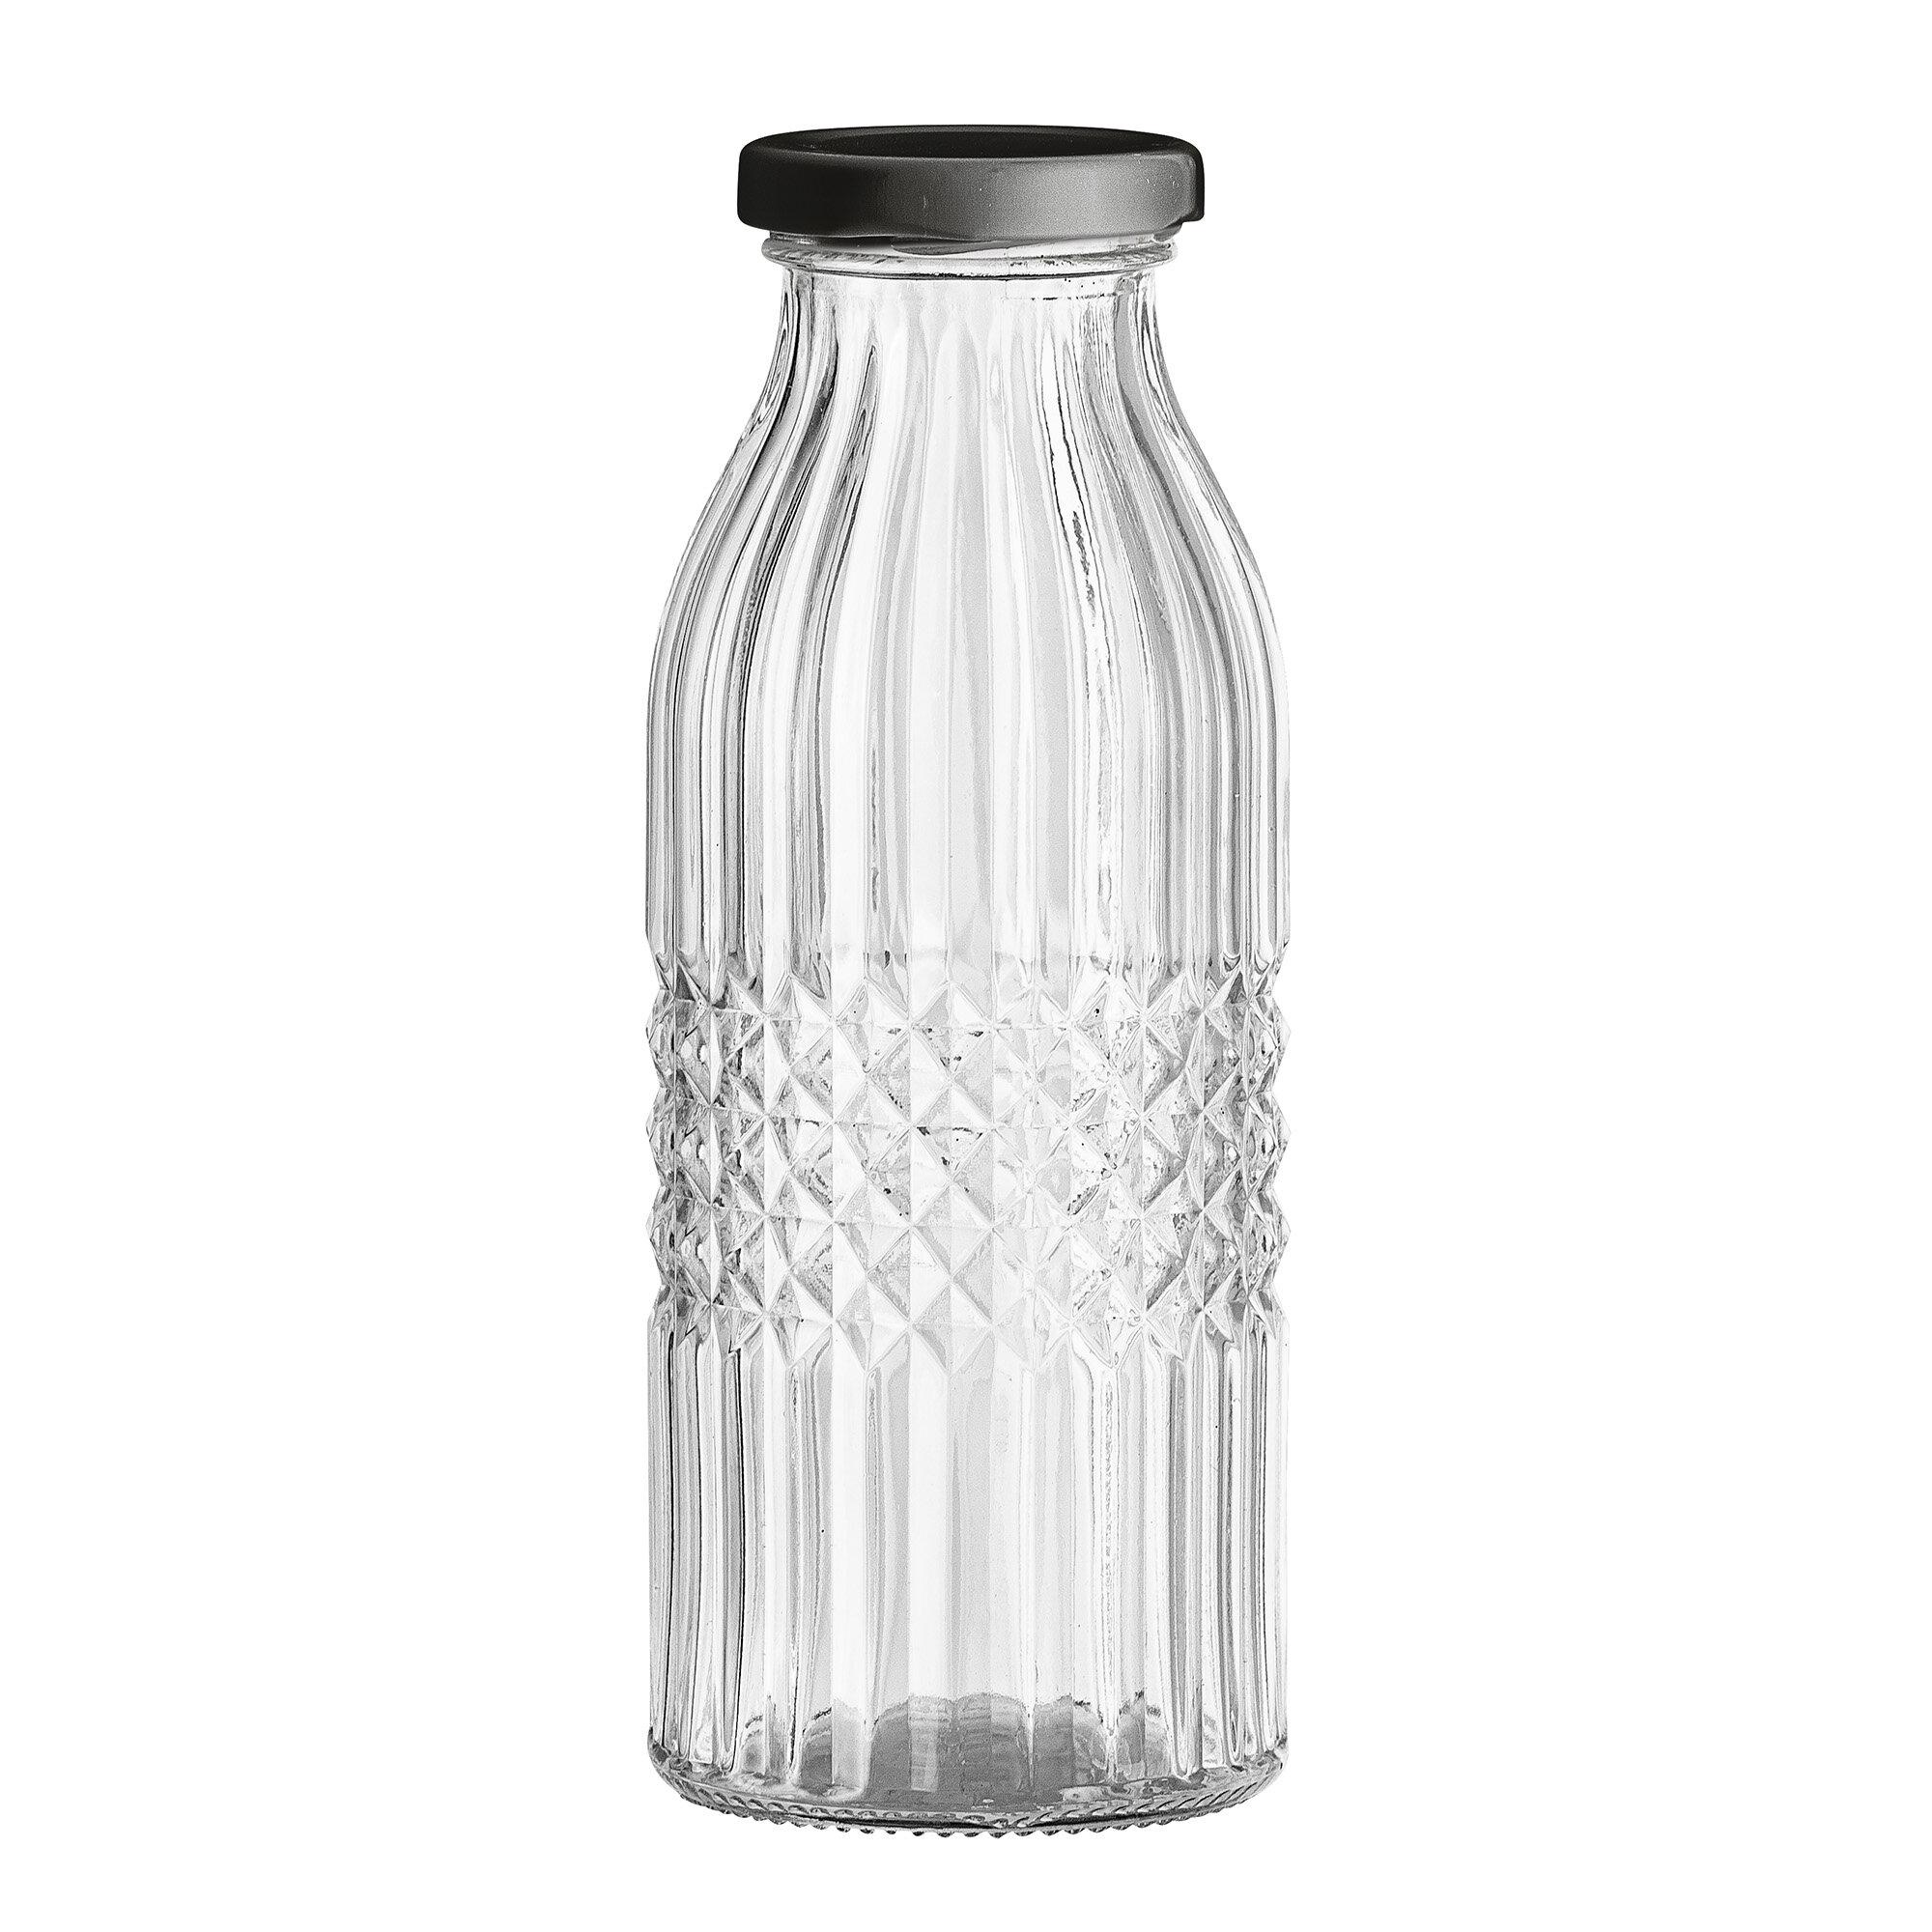 Bloomingville Glass Decorative Bottle Wayfair Co Uk